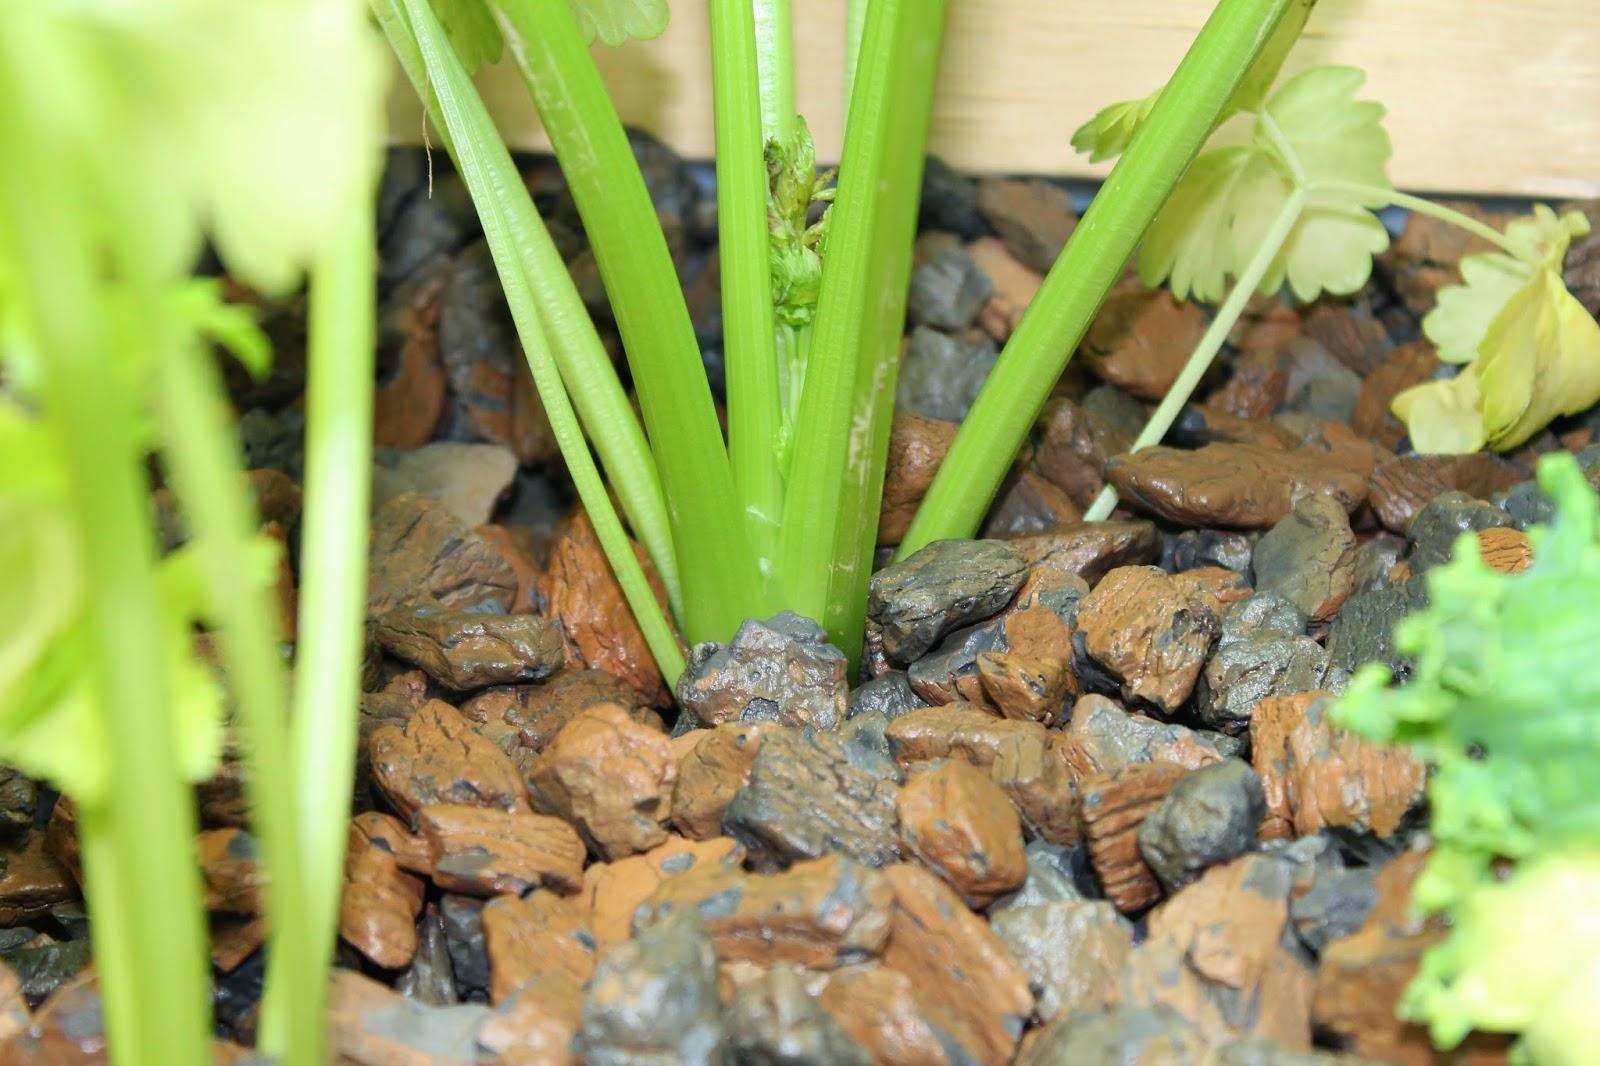 Suburban Aquaponics - Transplanting and Root Development